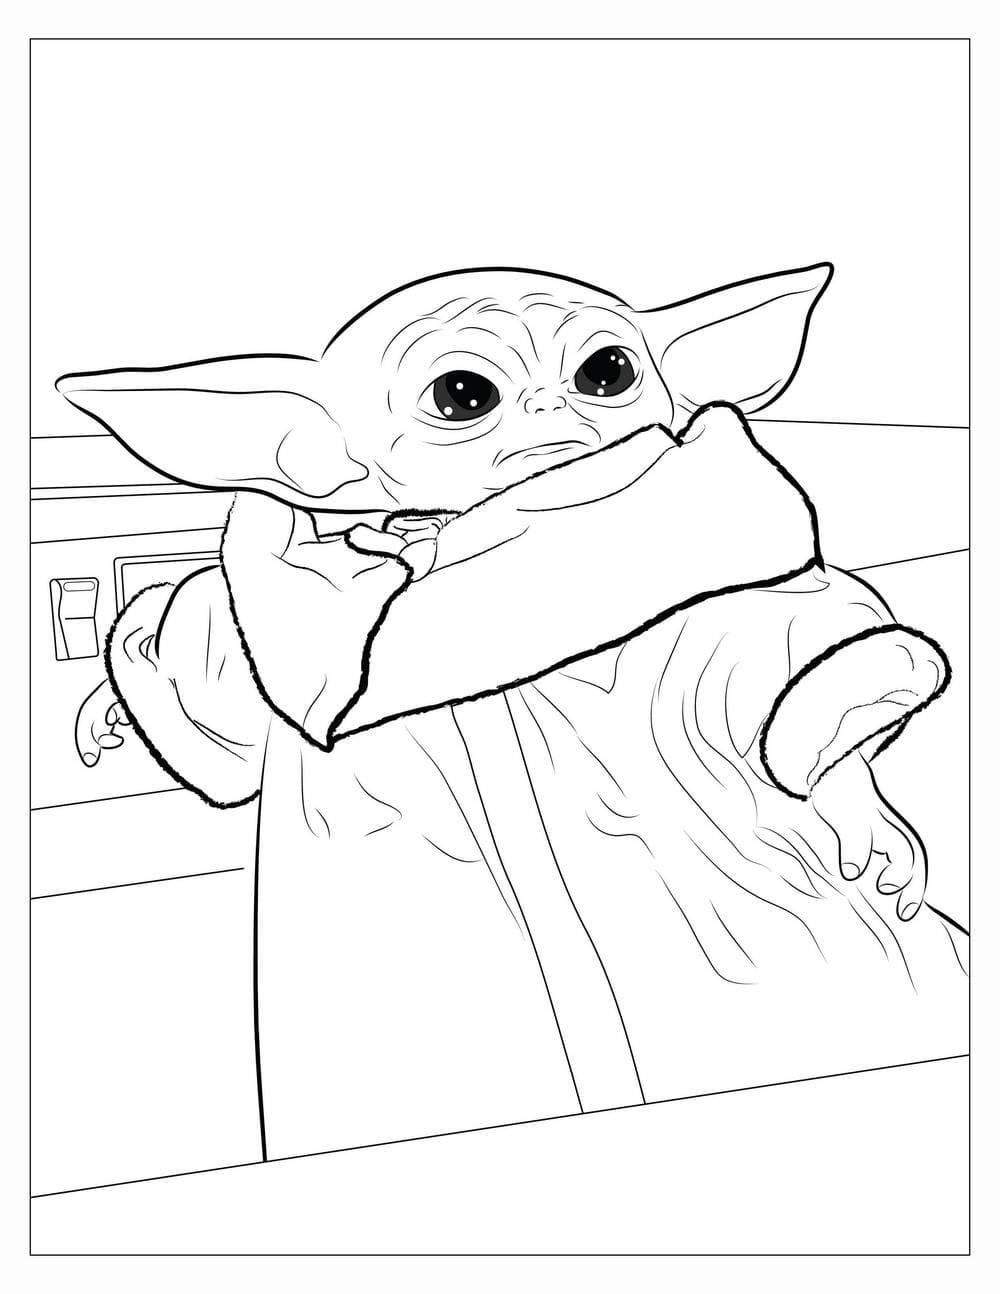 Baby Yoda Coloring Page